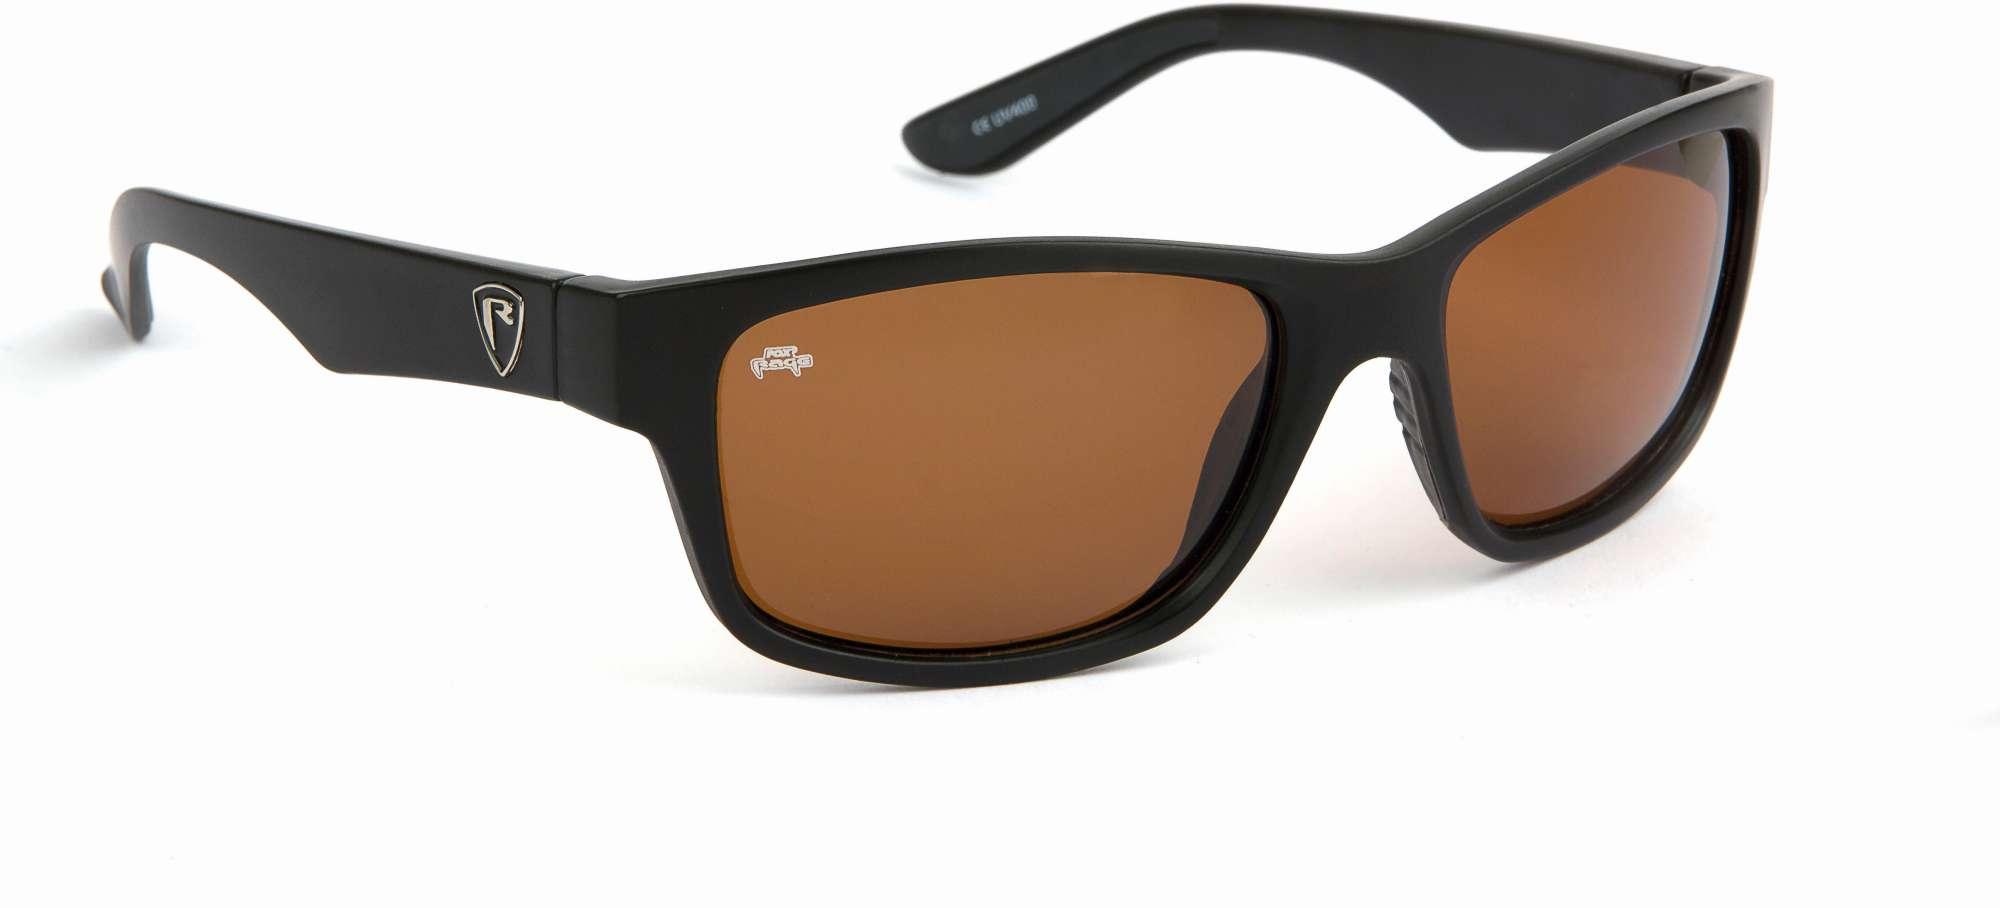 7460ba828 Poloraised lenses to enhance fishing vision - Light but strong frames -  Modern design for bank and street